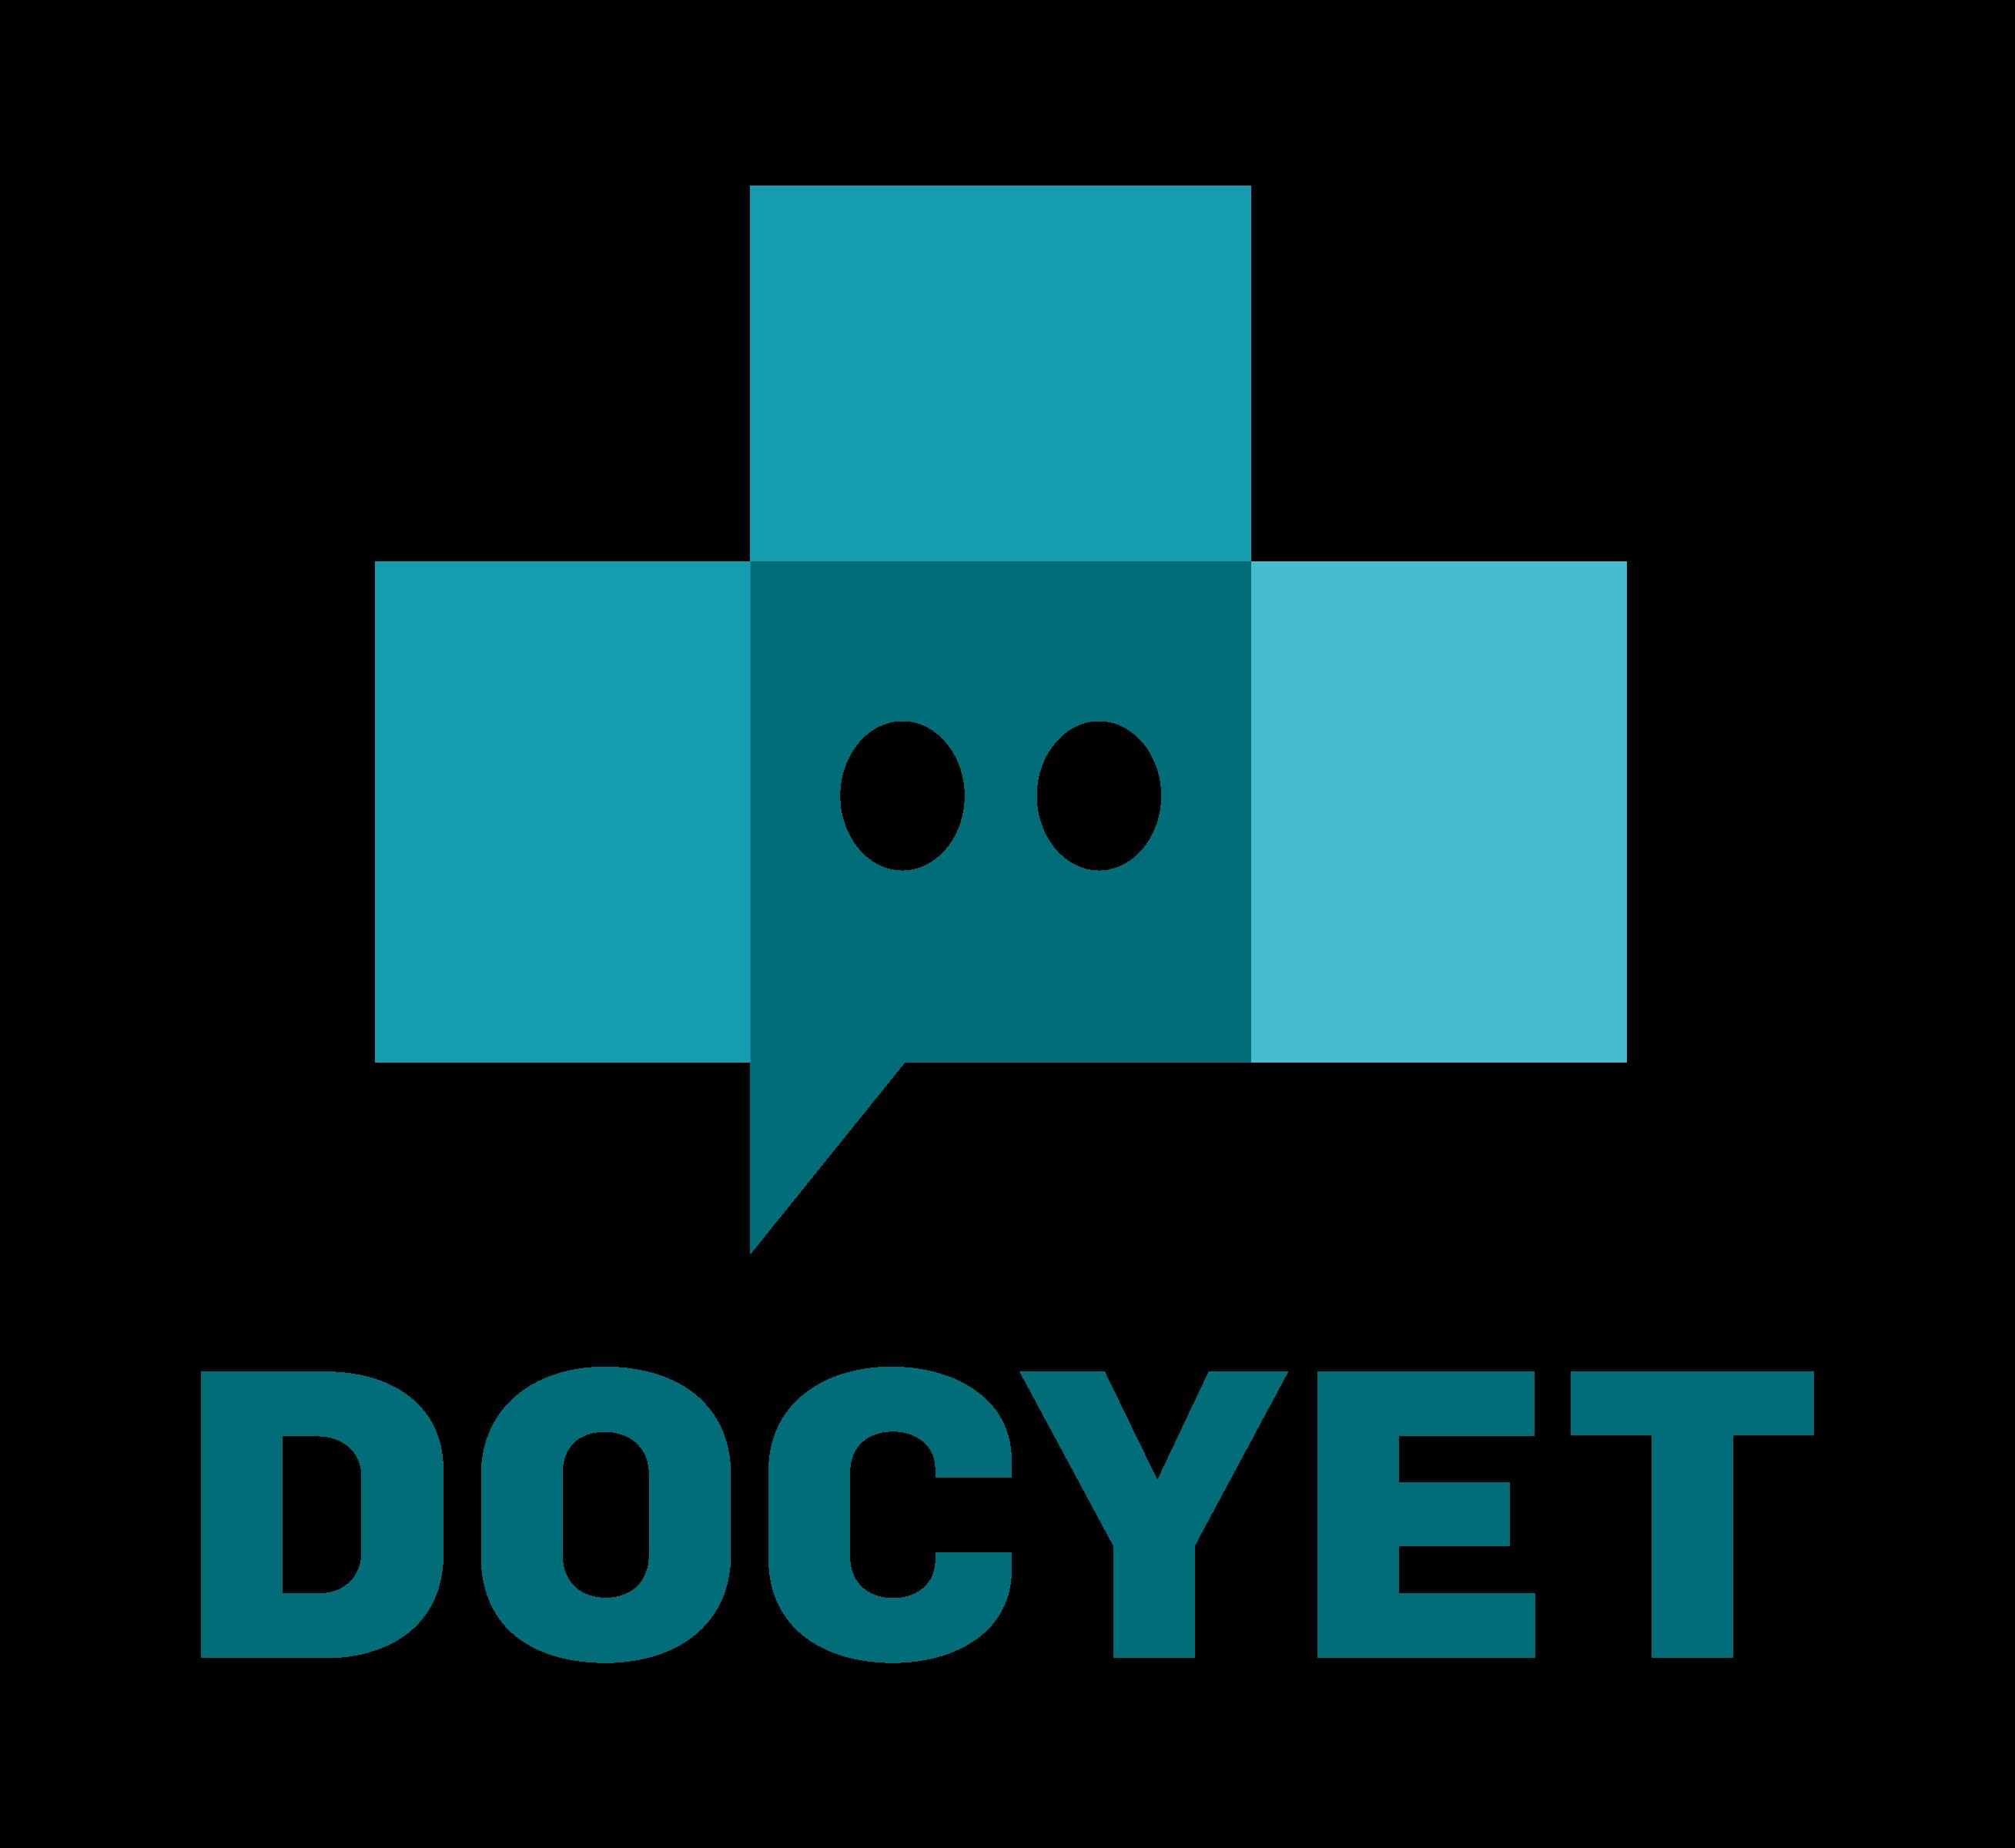 DOCYET UG